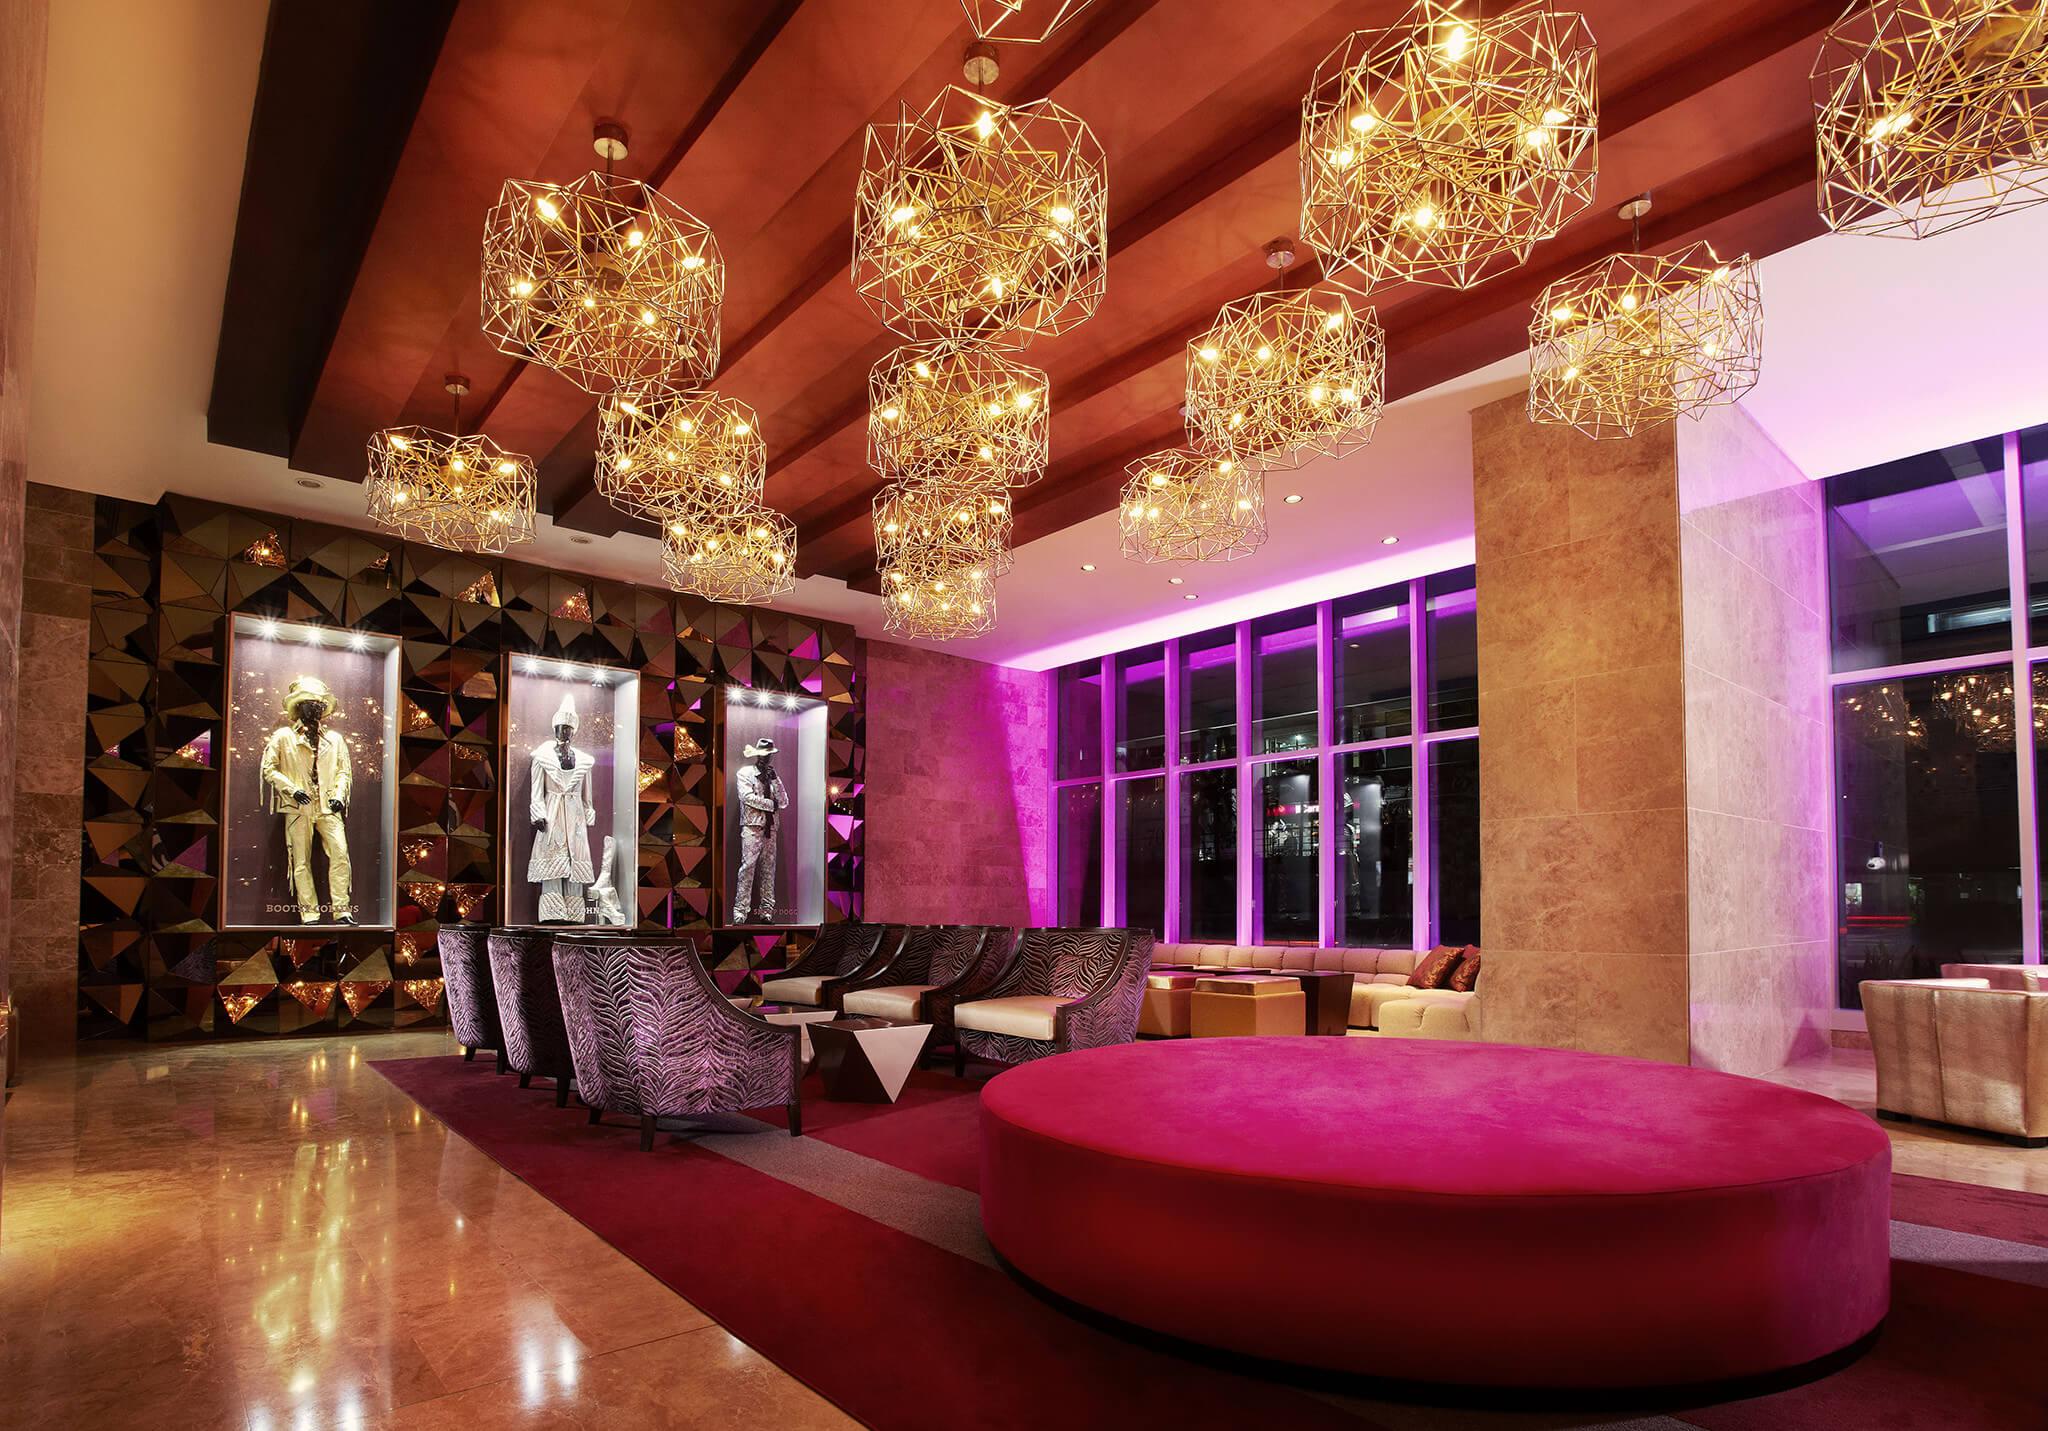 Lobby of the Hard Rock Hotel in Panama